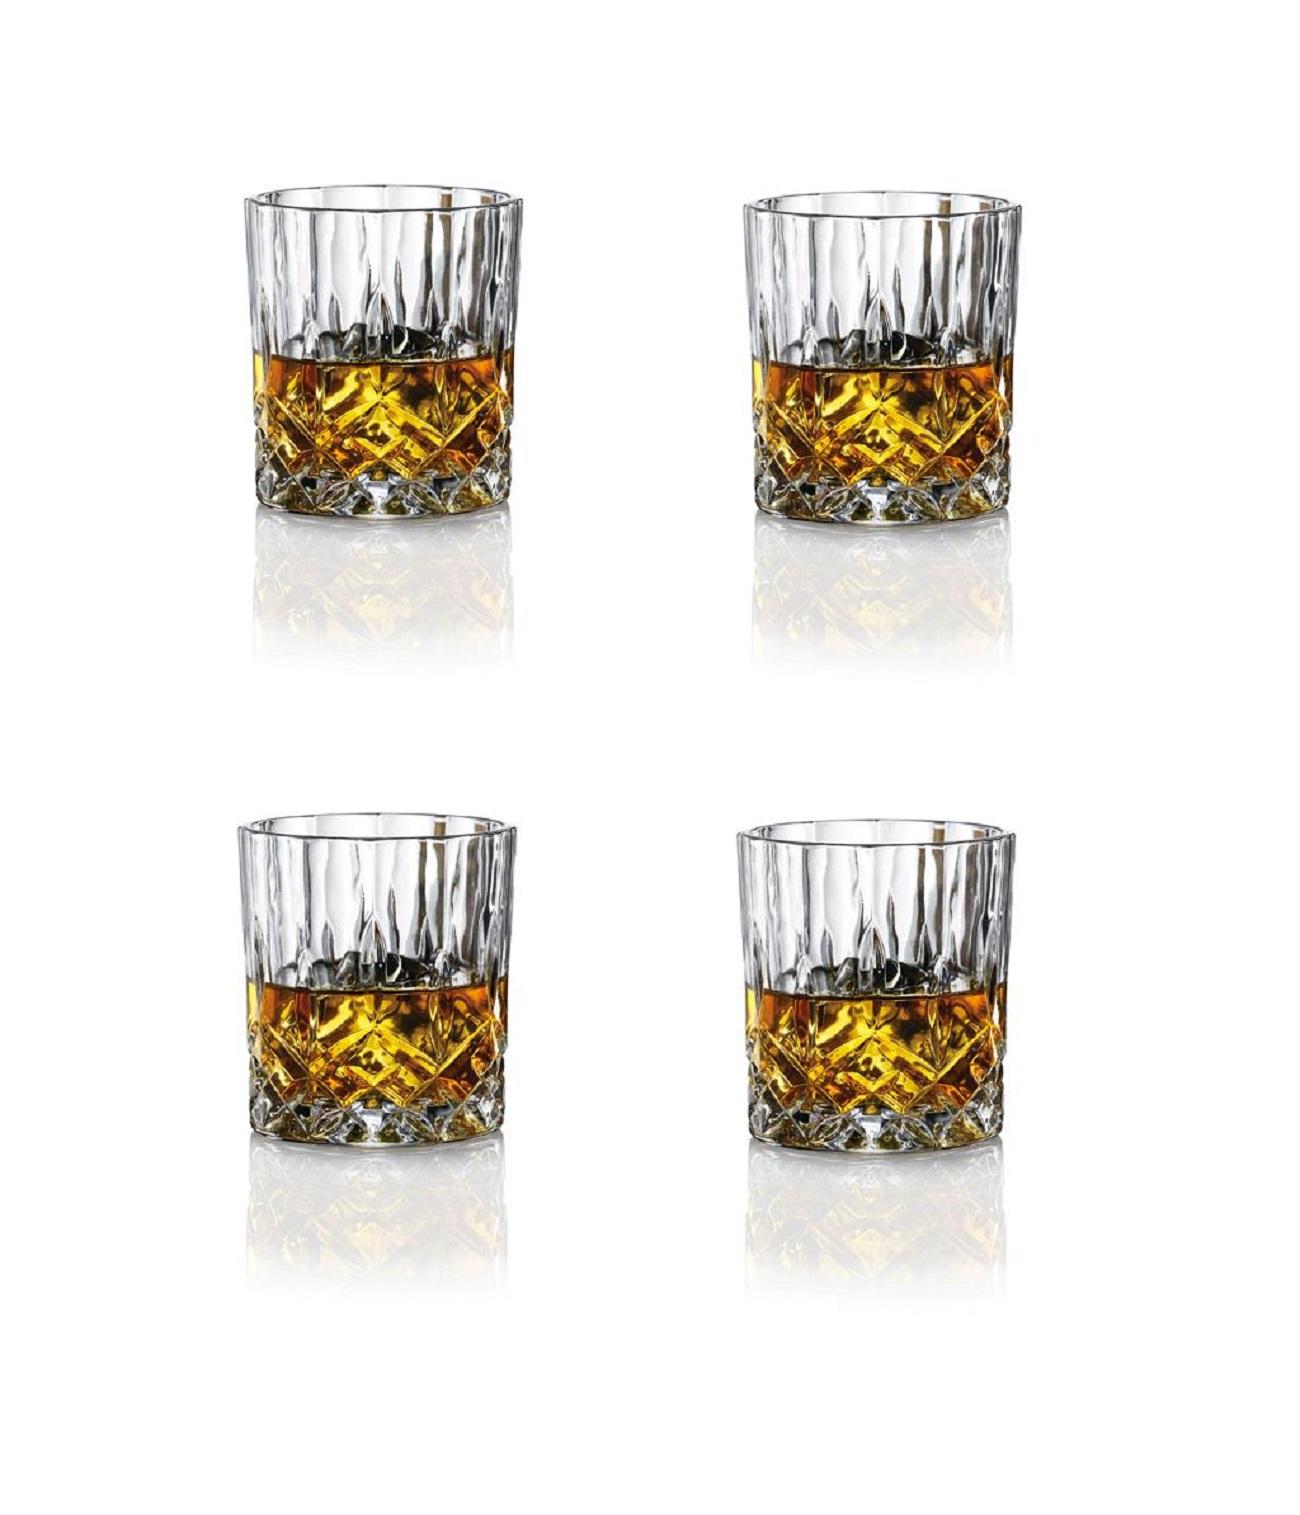 Онлайн каталог PROMENU: Набор бокалов для виски Aida HARVEY, объем 0,31 л, 8,5х9,2 см, прозрачный, 4 штуки                               80313